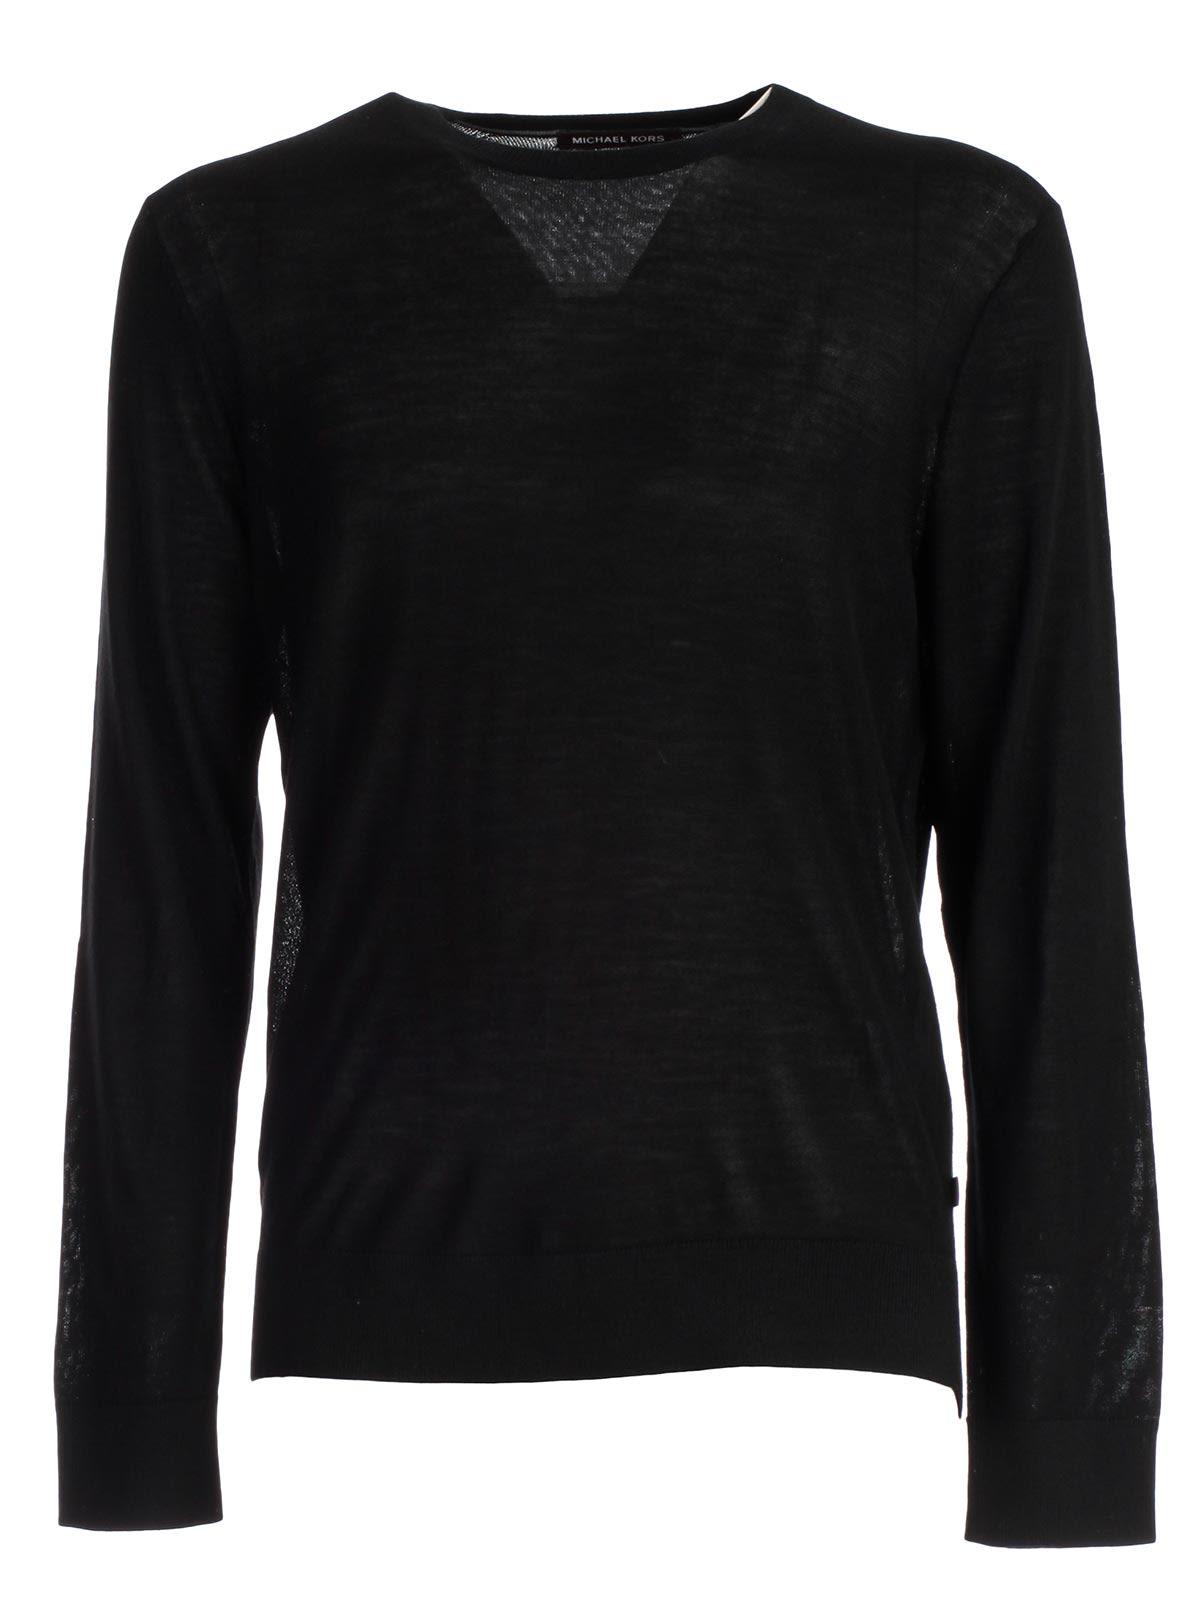 Michael Kors Crew Neck Sweater